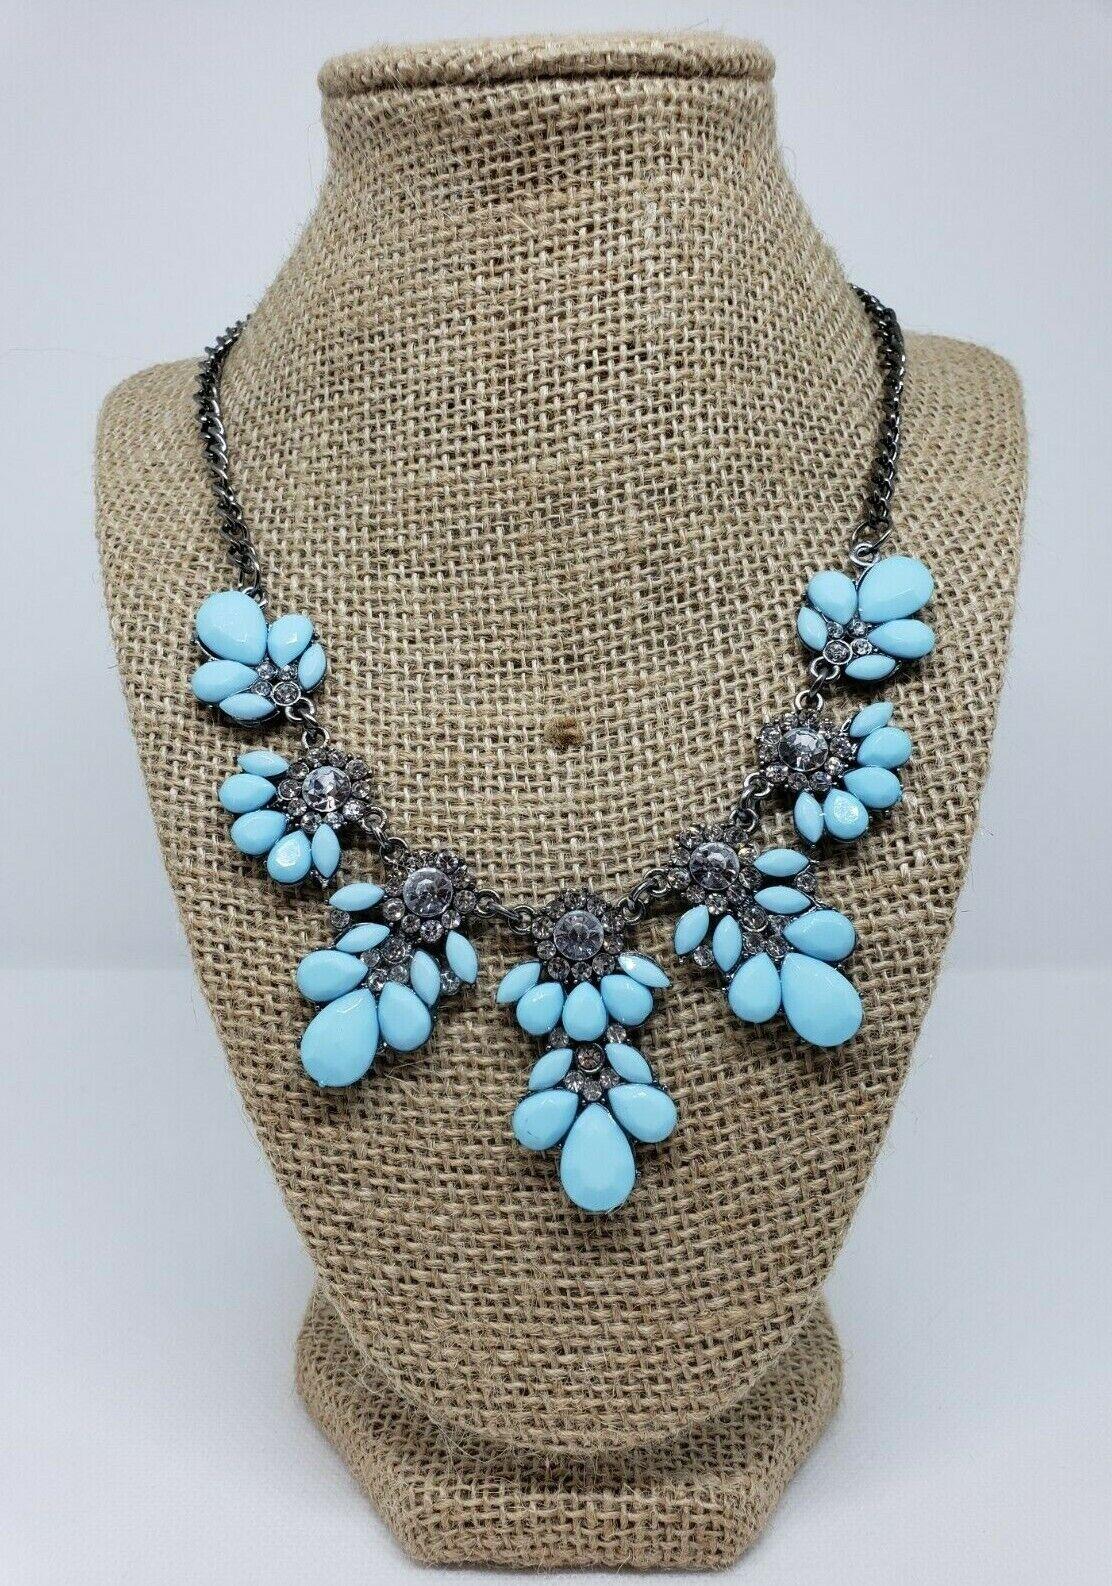 Jewellery - Women's Floral Flower Necklace Rhinestones Blue Gun Metal Gray Fashion Jewelry